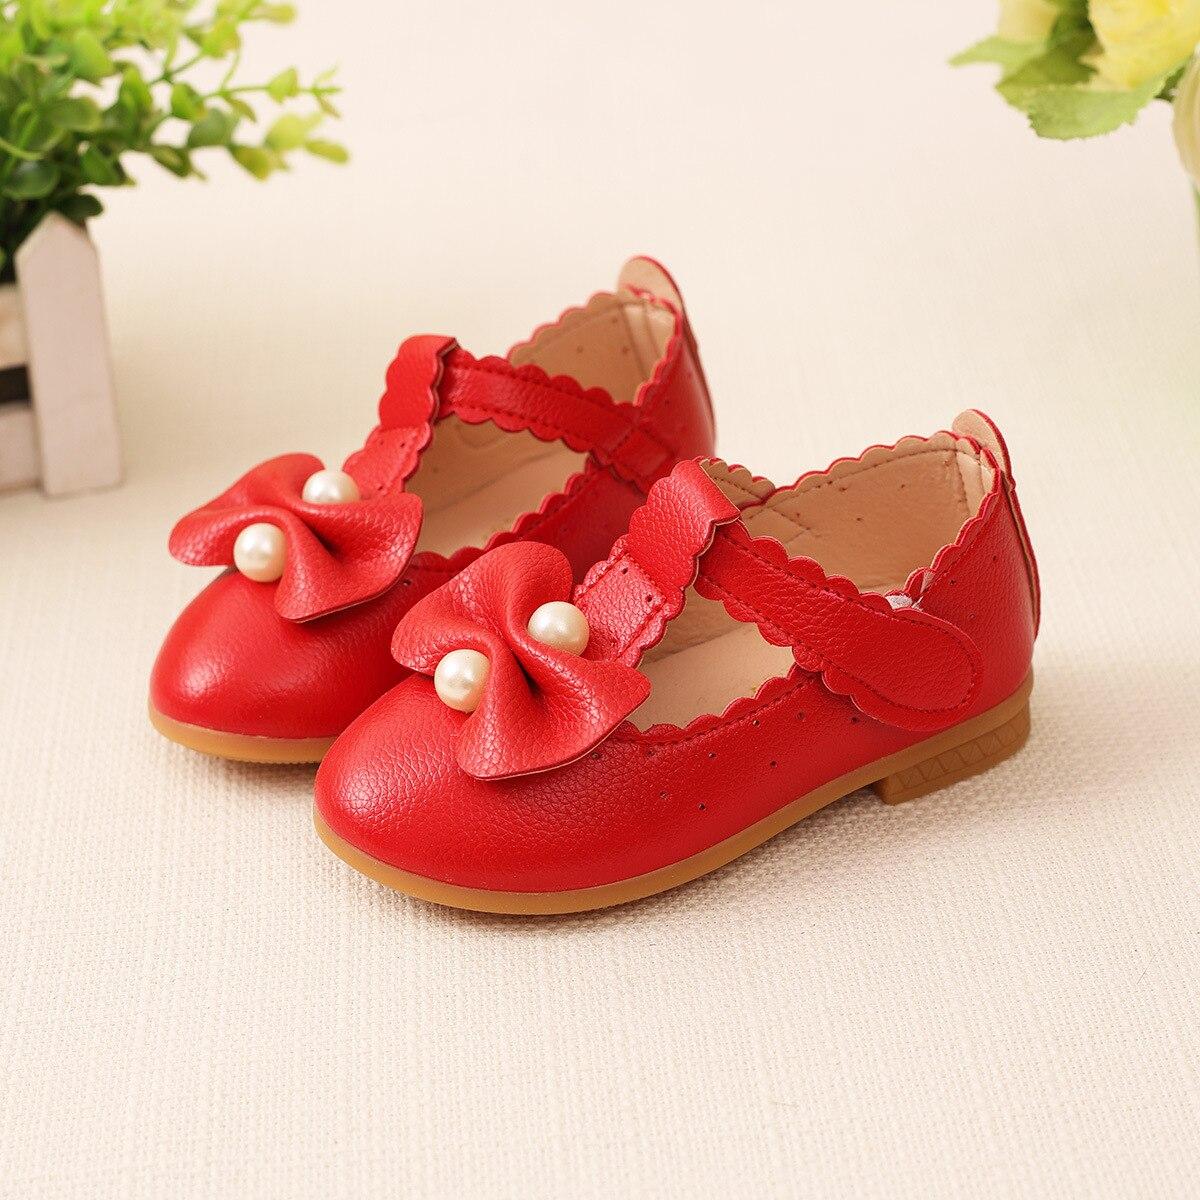 Children Shoes Girls Shoes Autumn Fashion Princess Sandals Kid Designer Single Sandals Shoes for Girls size 21-30